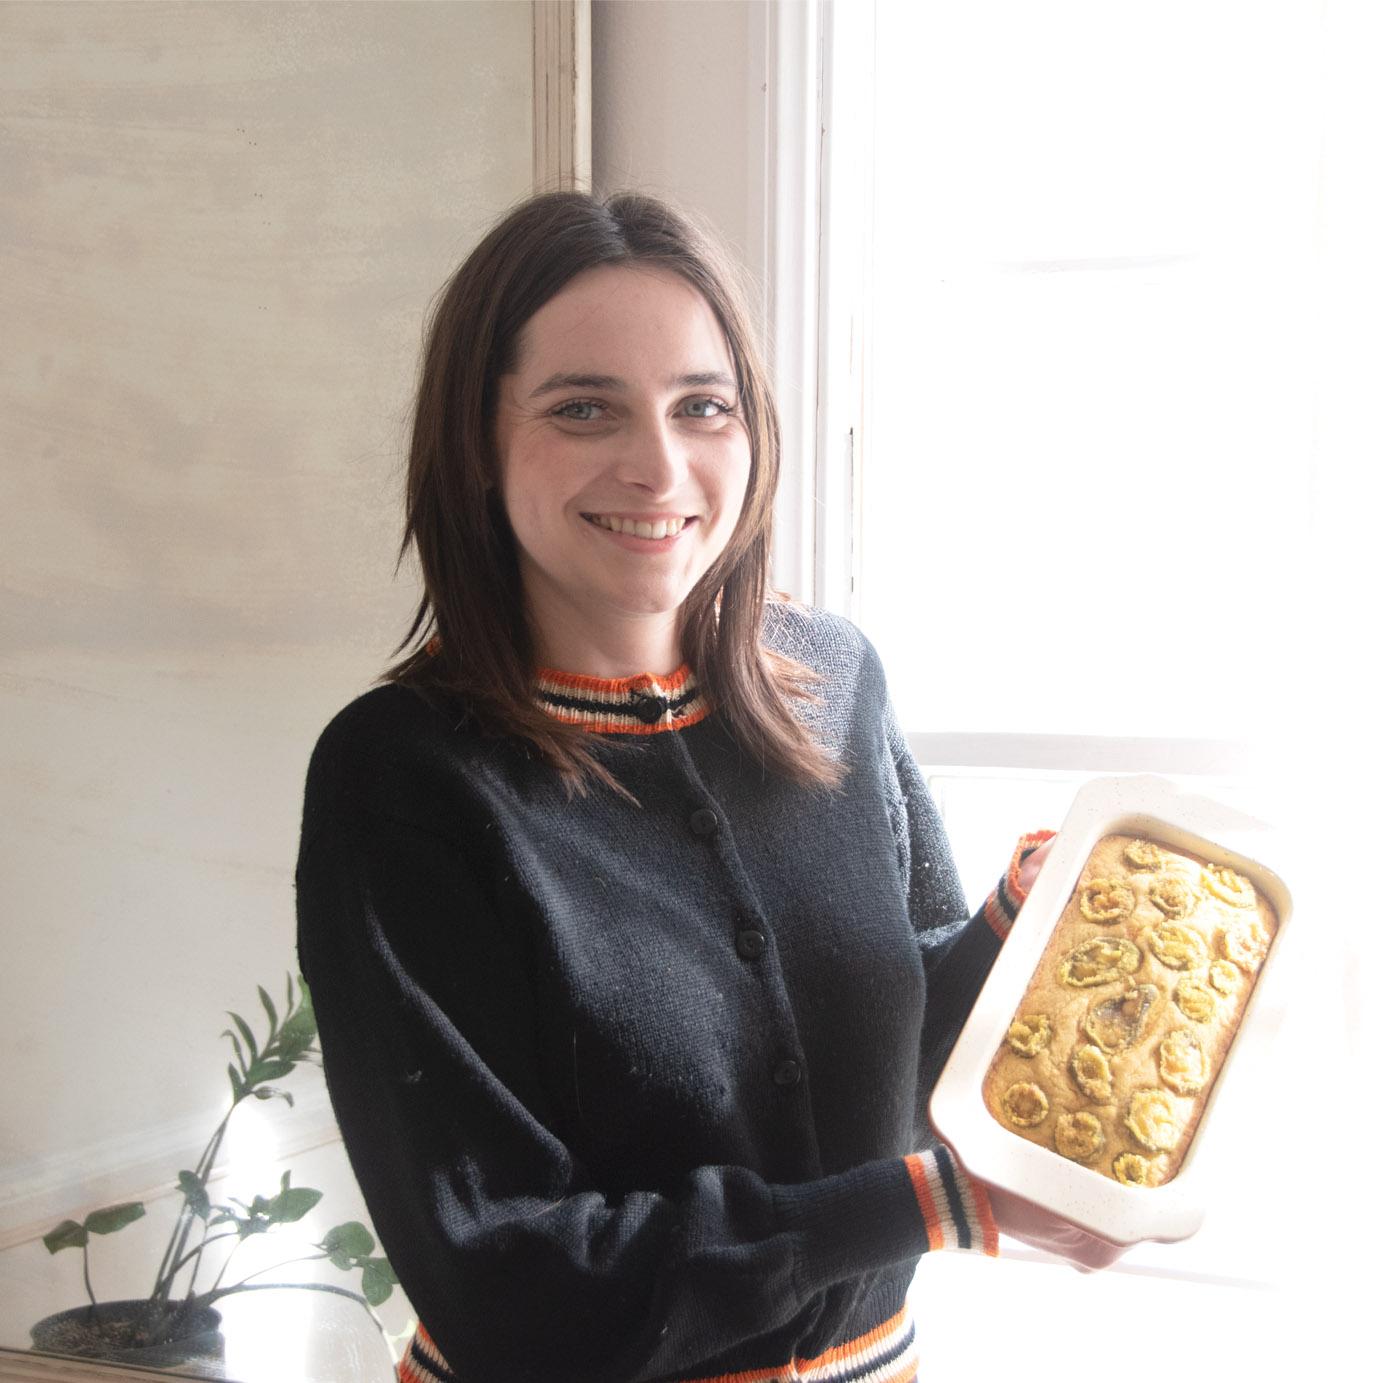 clara with bread.jpg